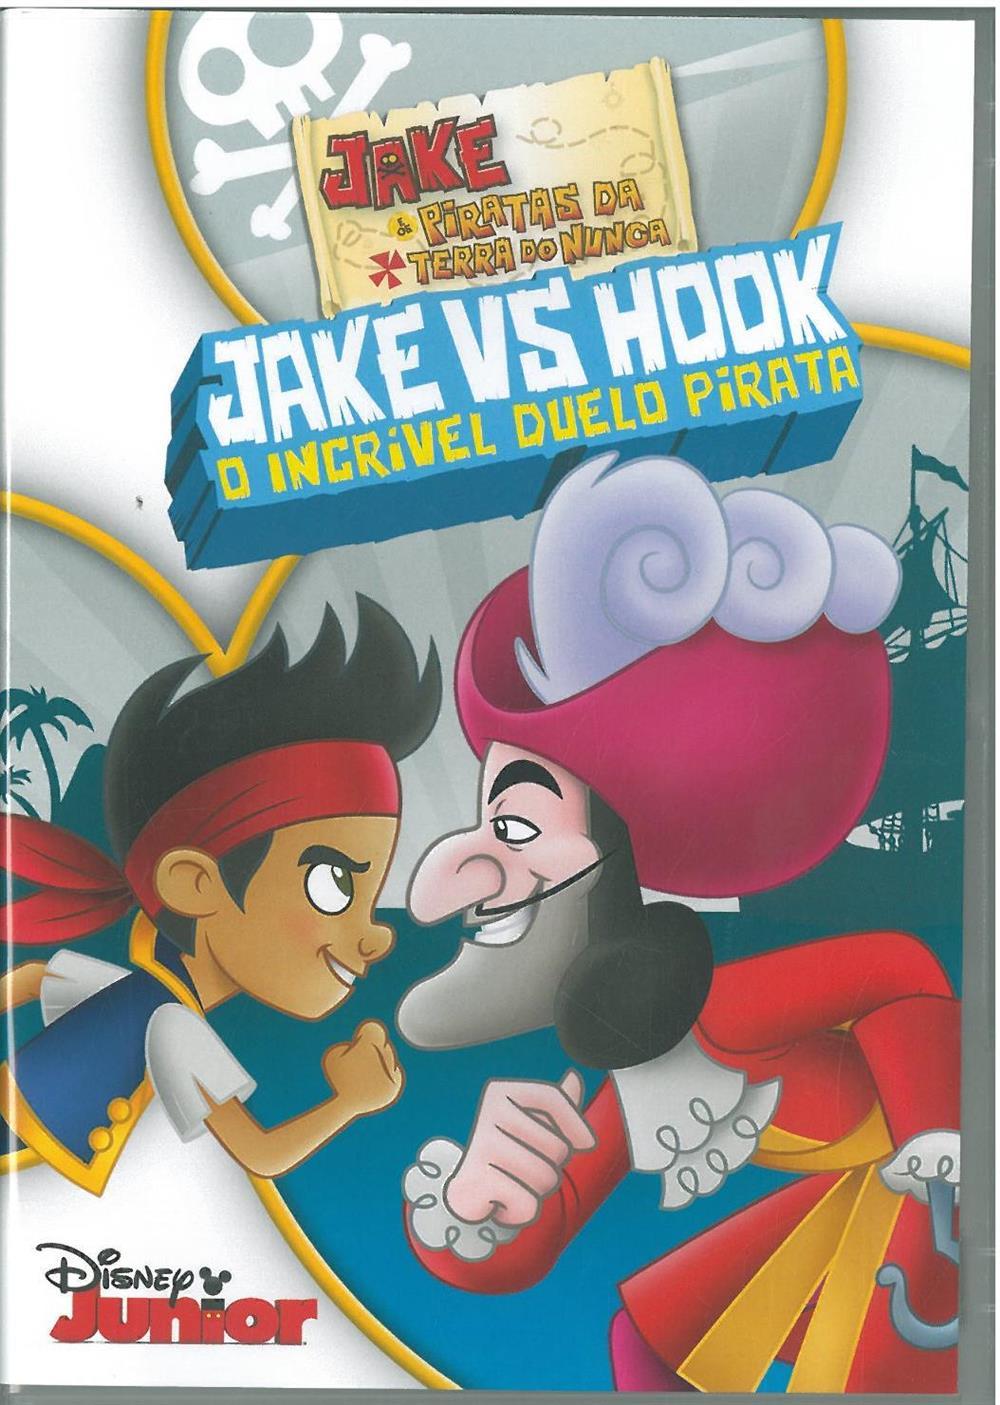 Jake vs Hook_DVD.jpg